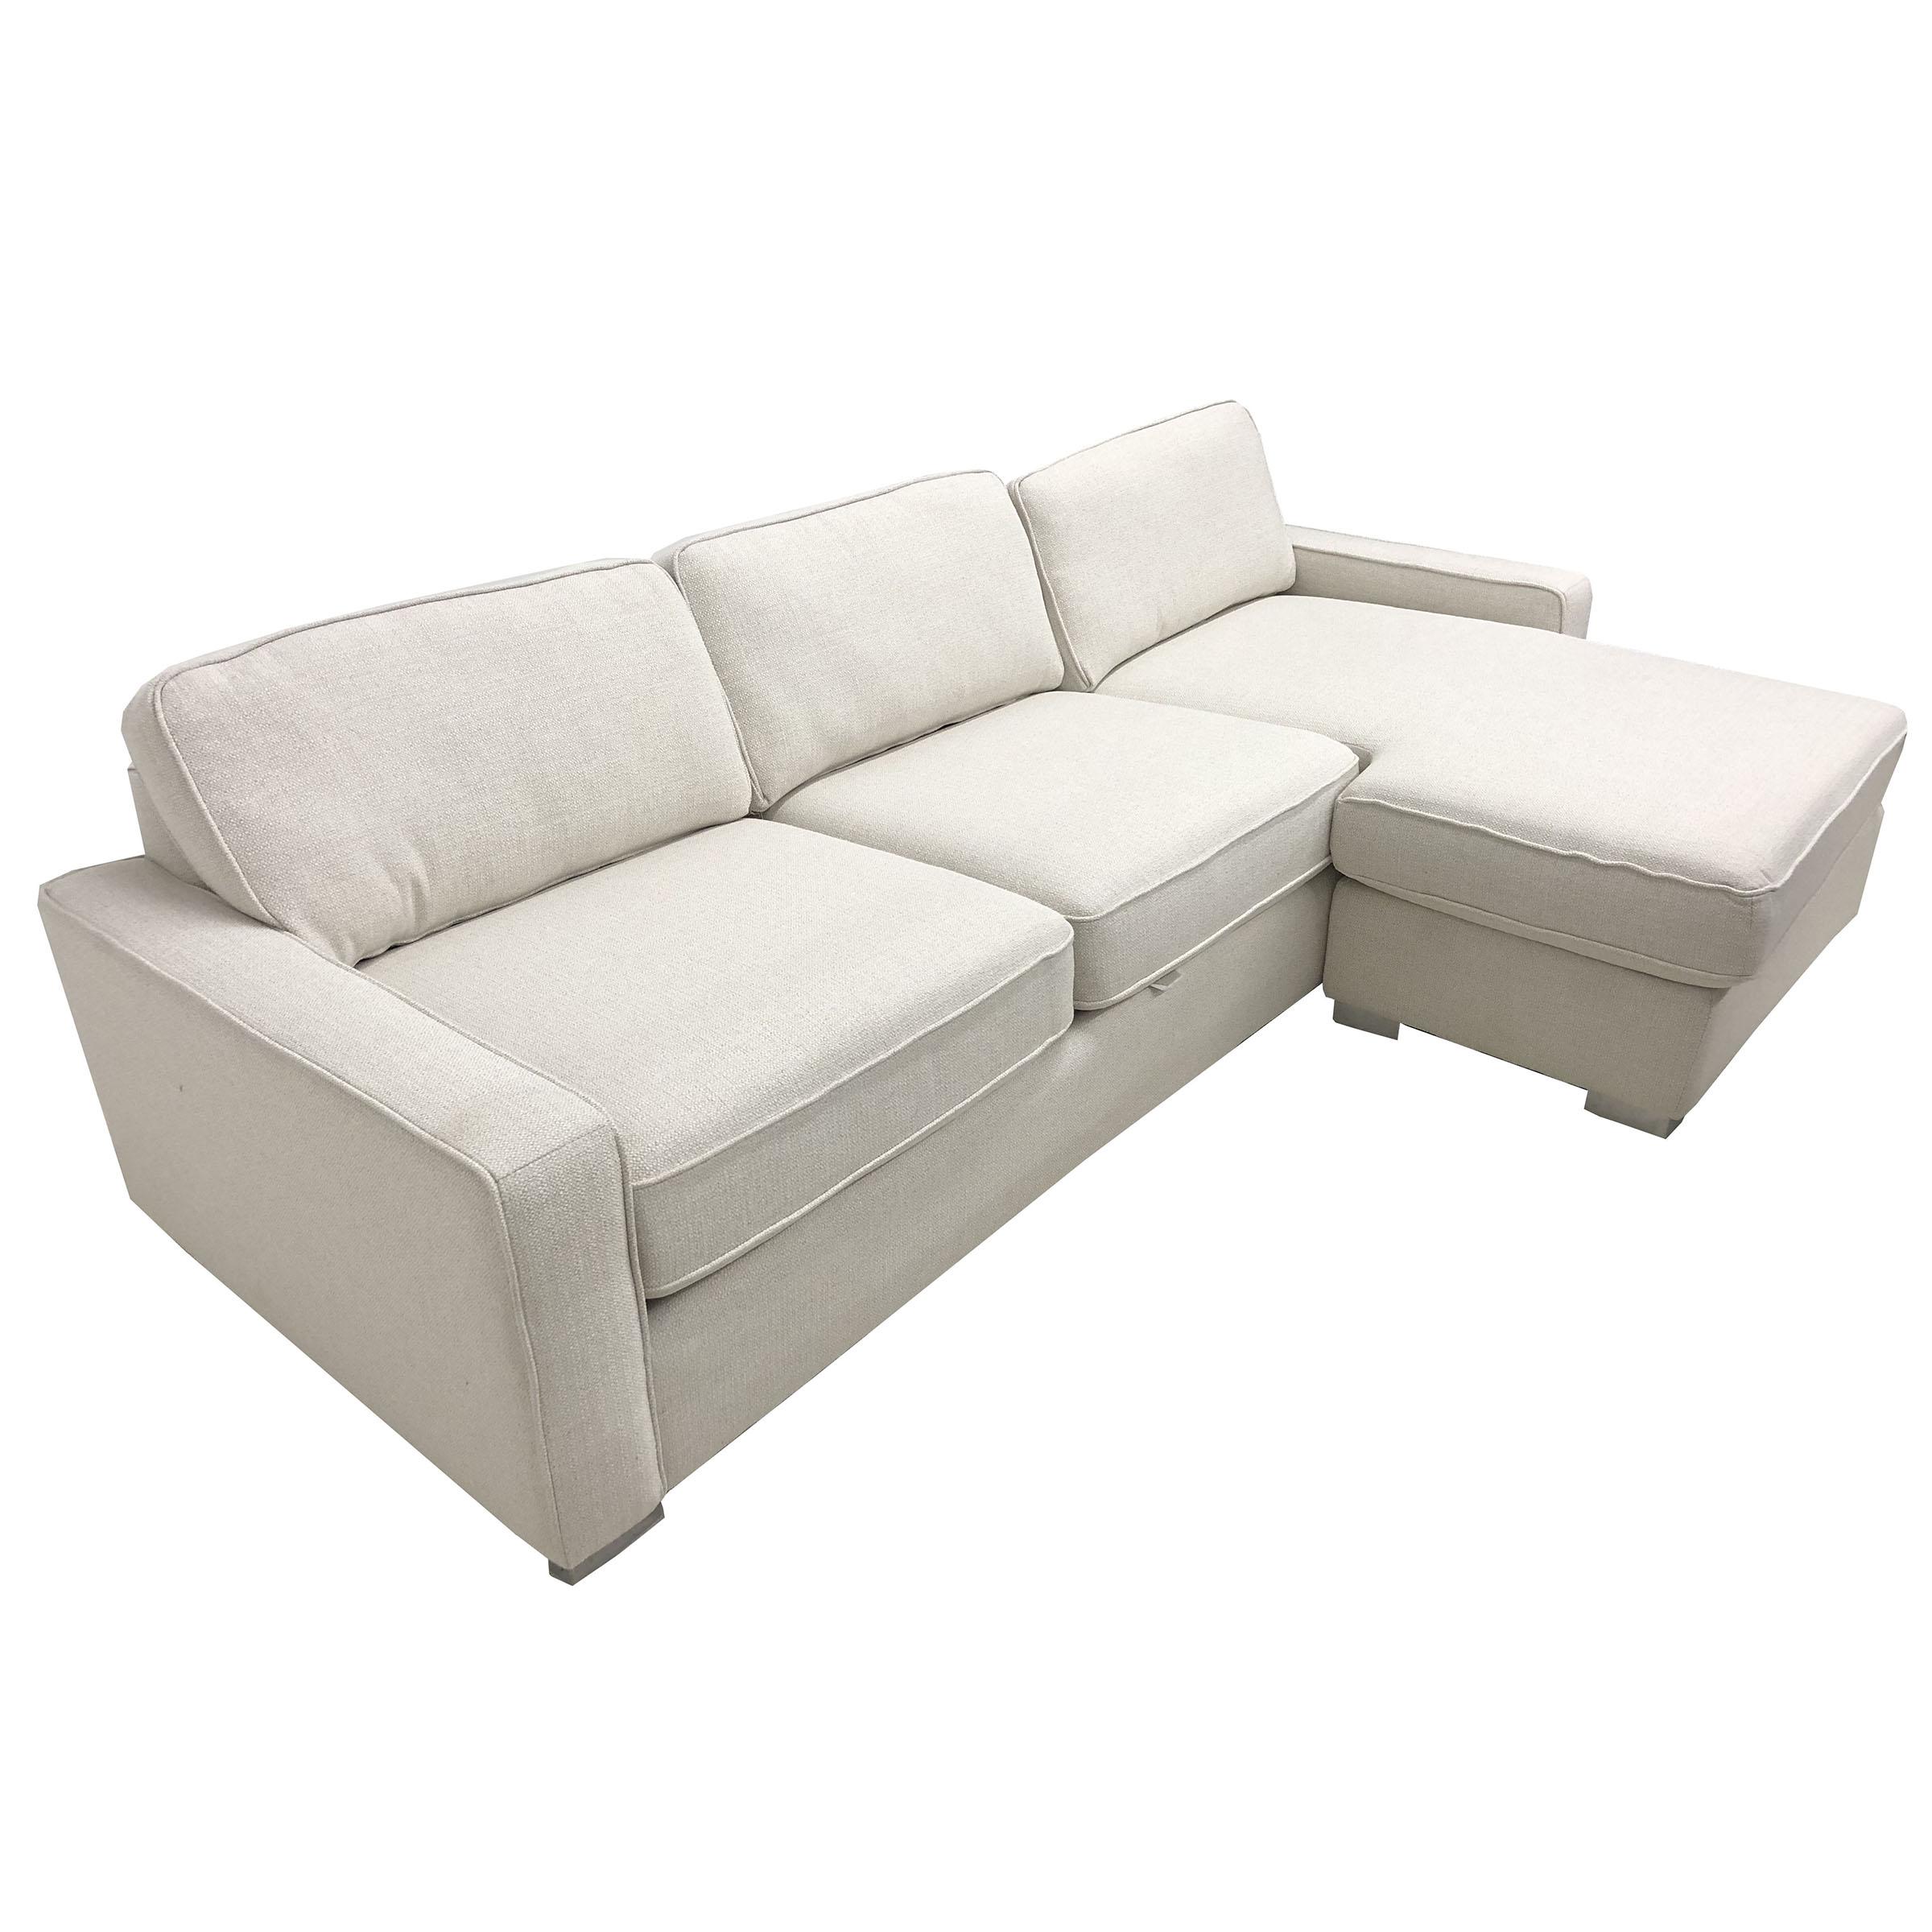 Mitch   Lux Furniture Rentals